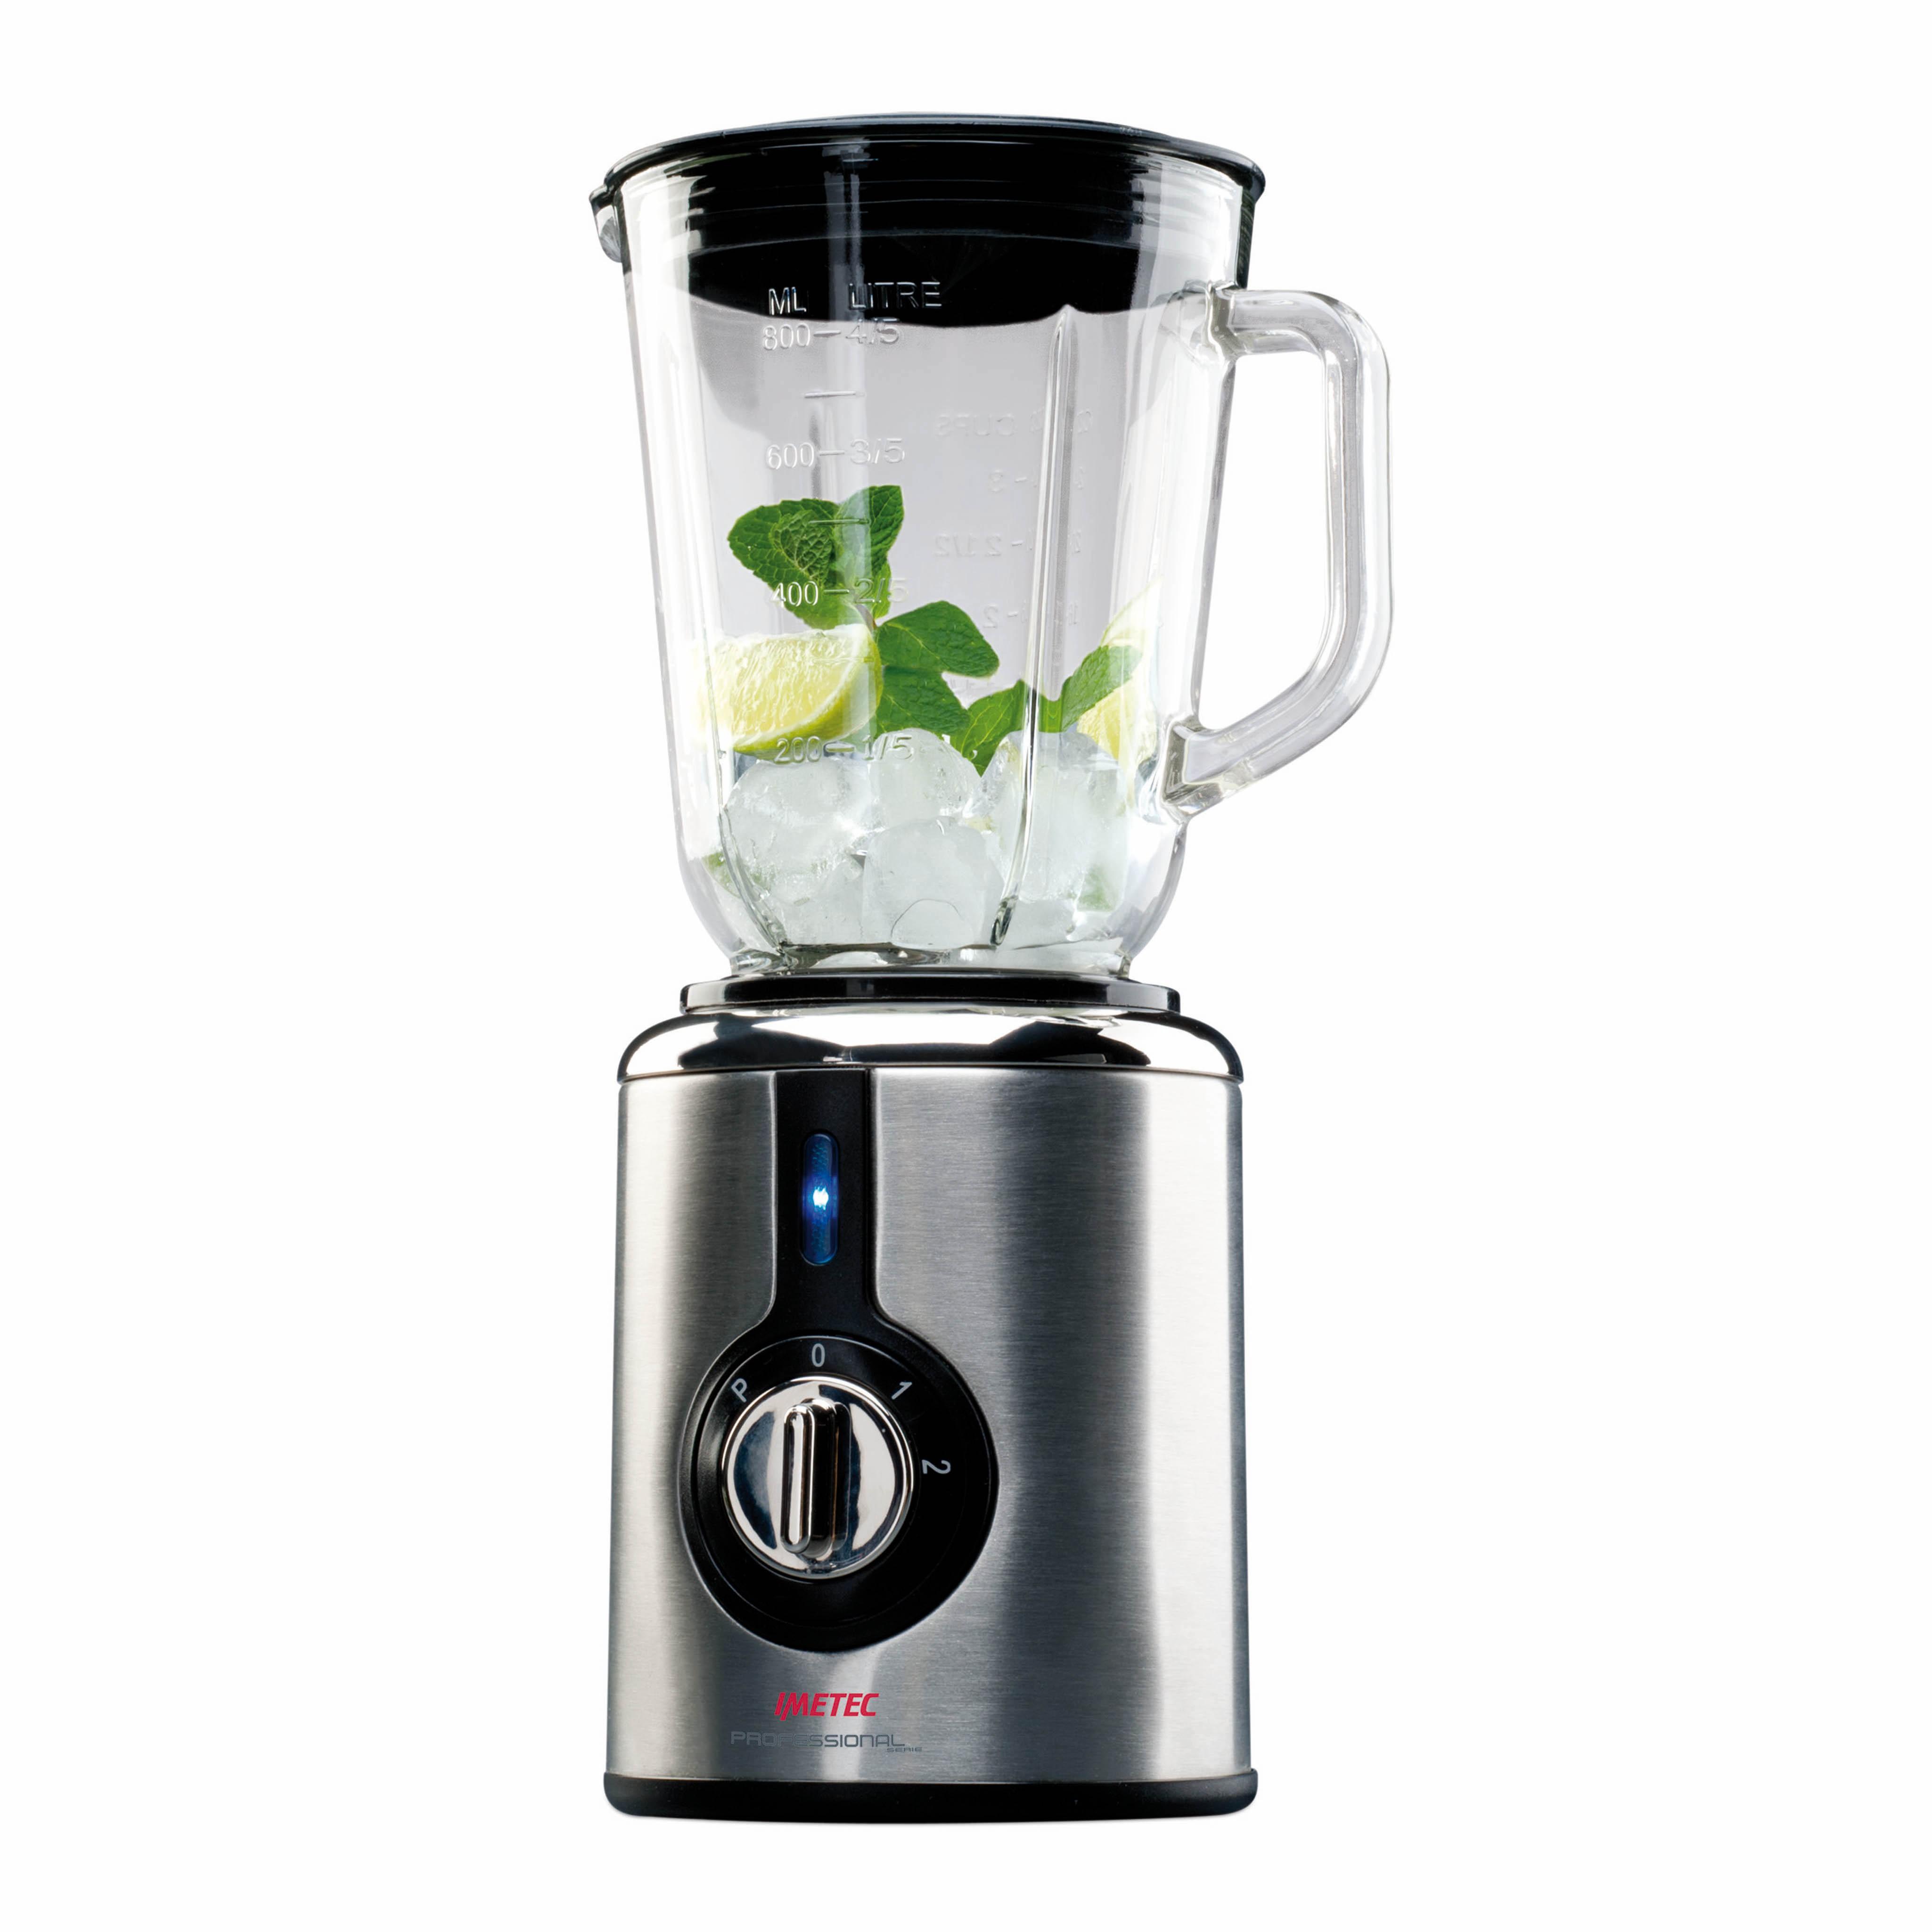 Frullatore da cucina prezzi e modelli consigliati con - Mixer da cucina prezzi ...